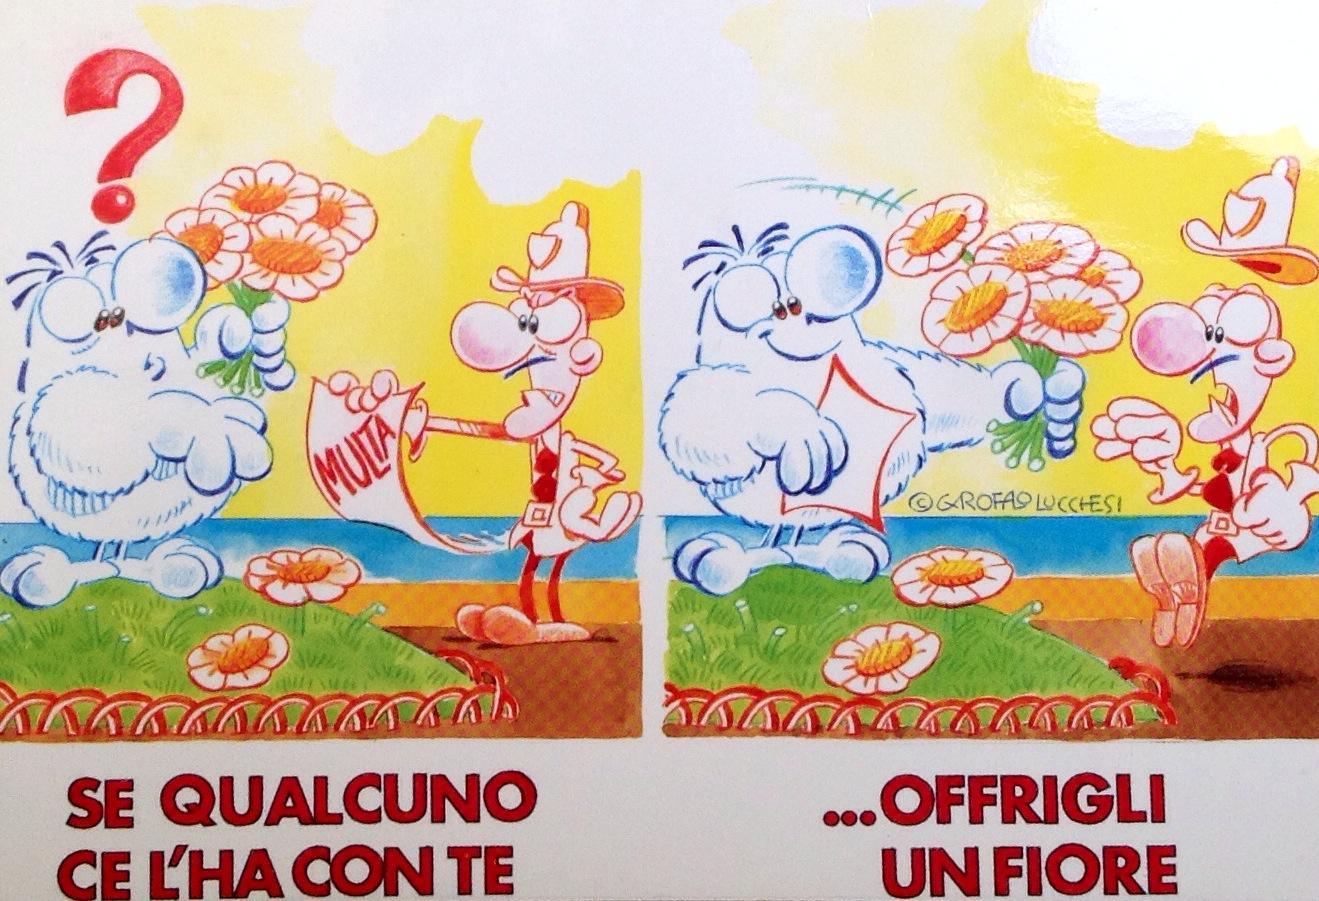 Cartolina Alfonso prende la multa 103x15 cm 1